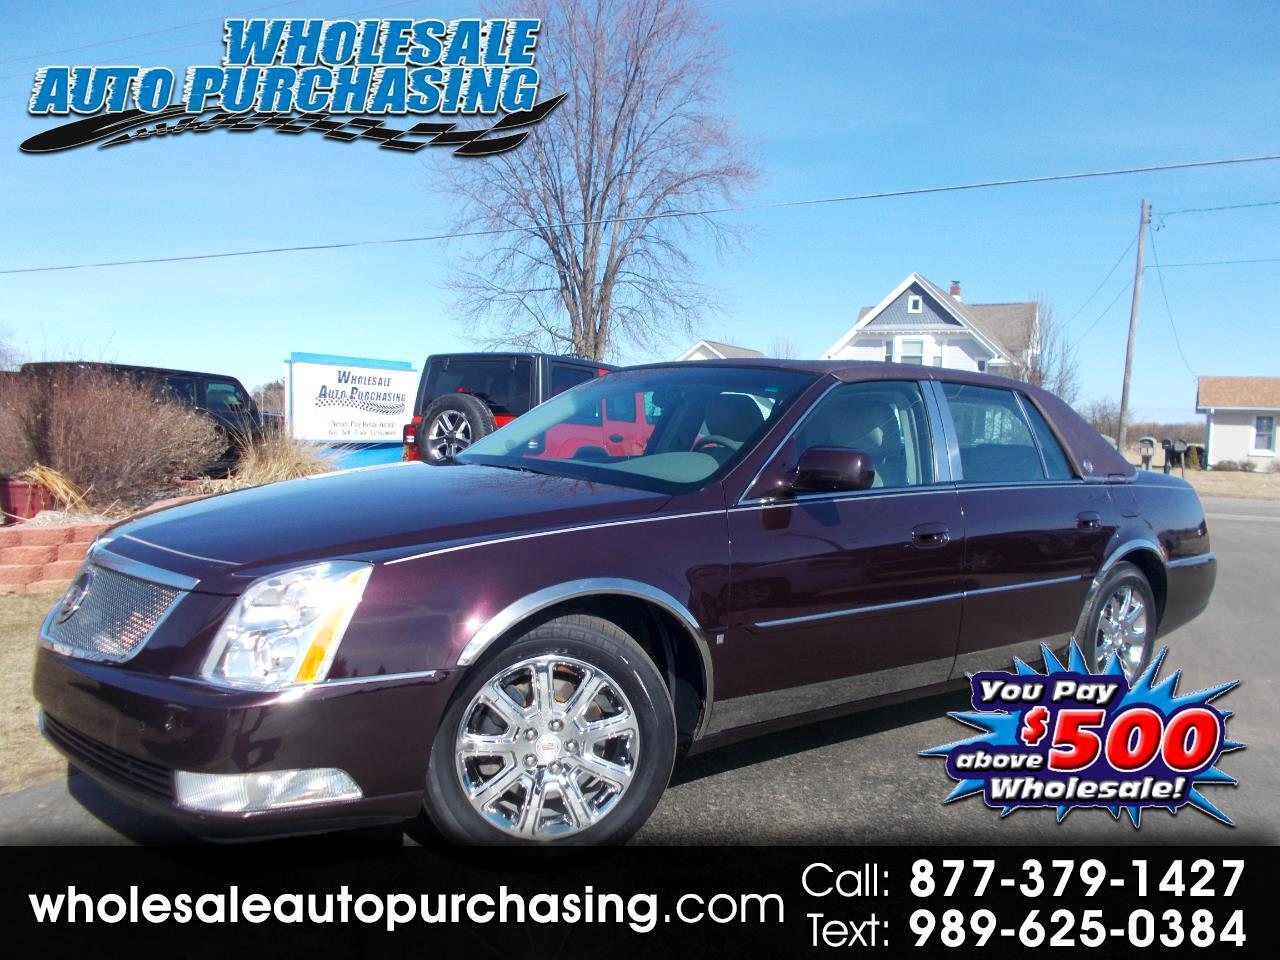 2008 Cadillac DTS 4dr Sdn w/1SC